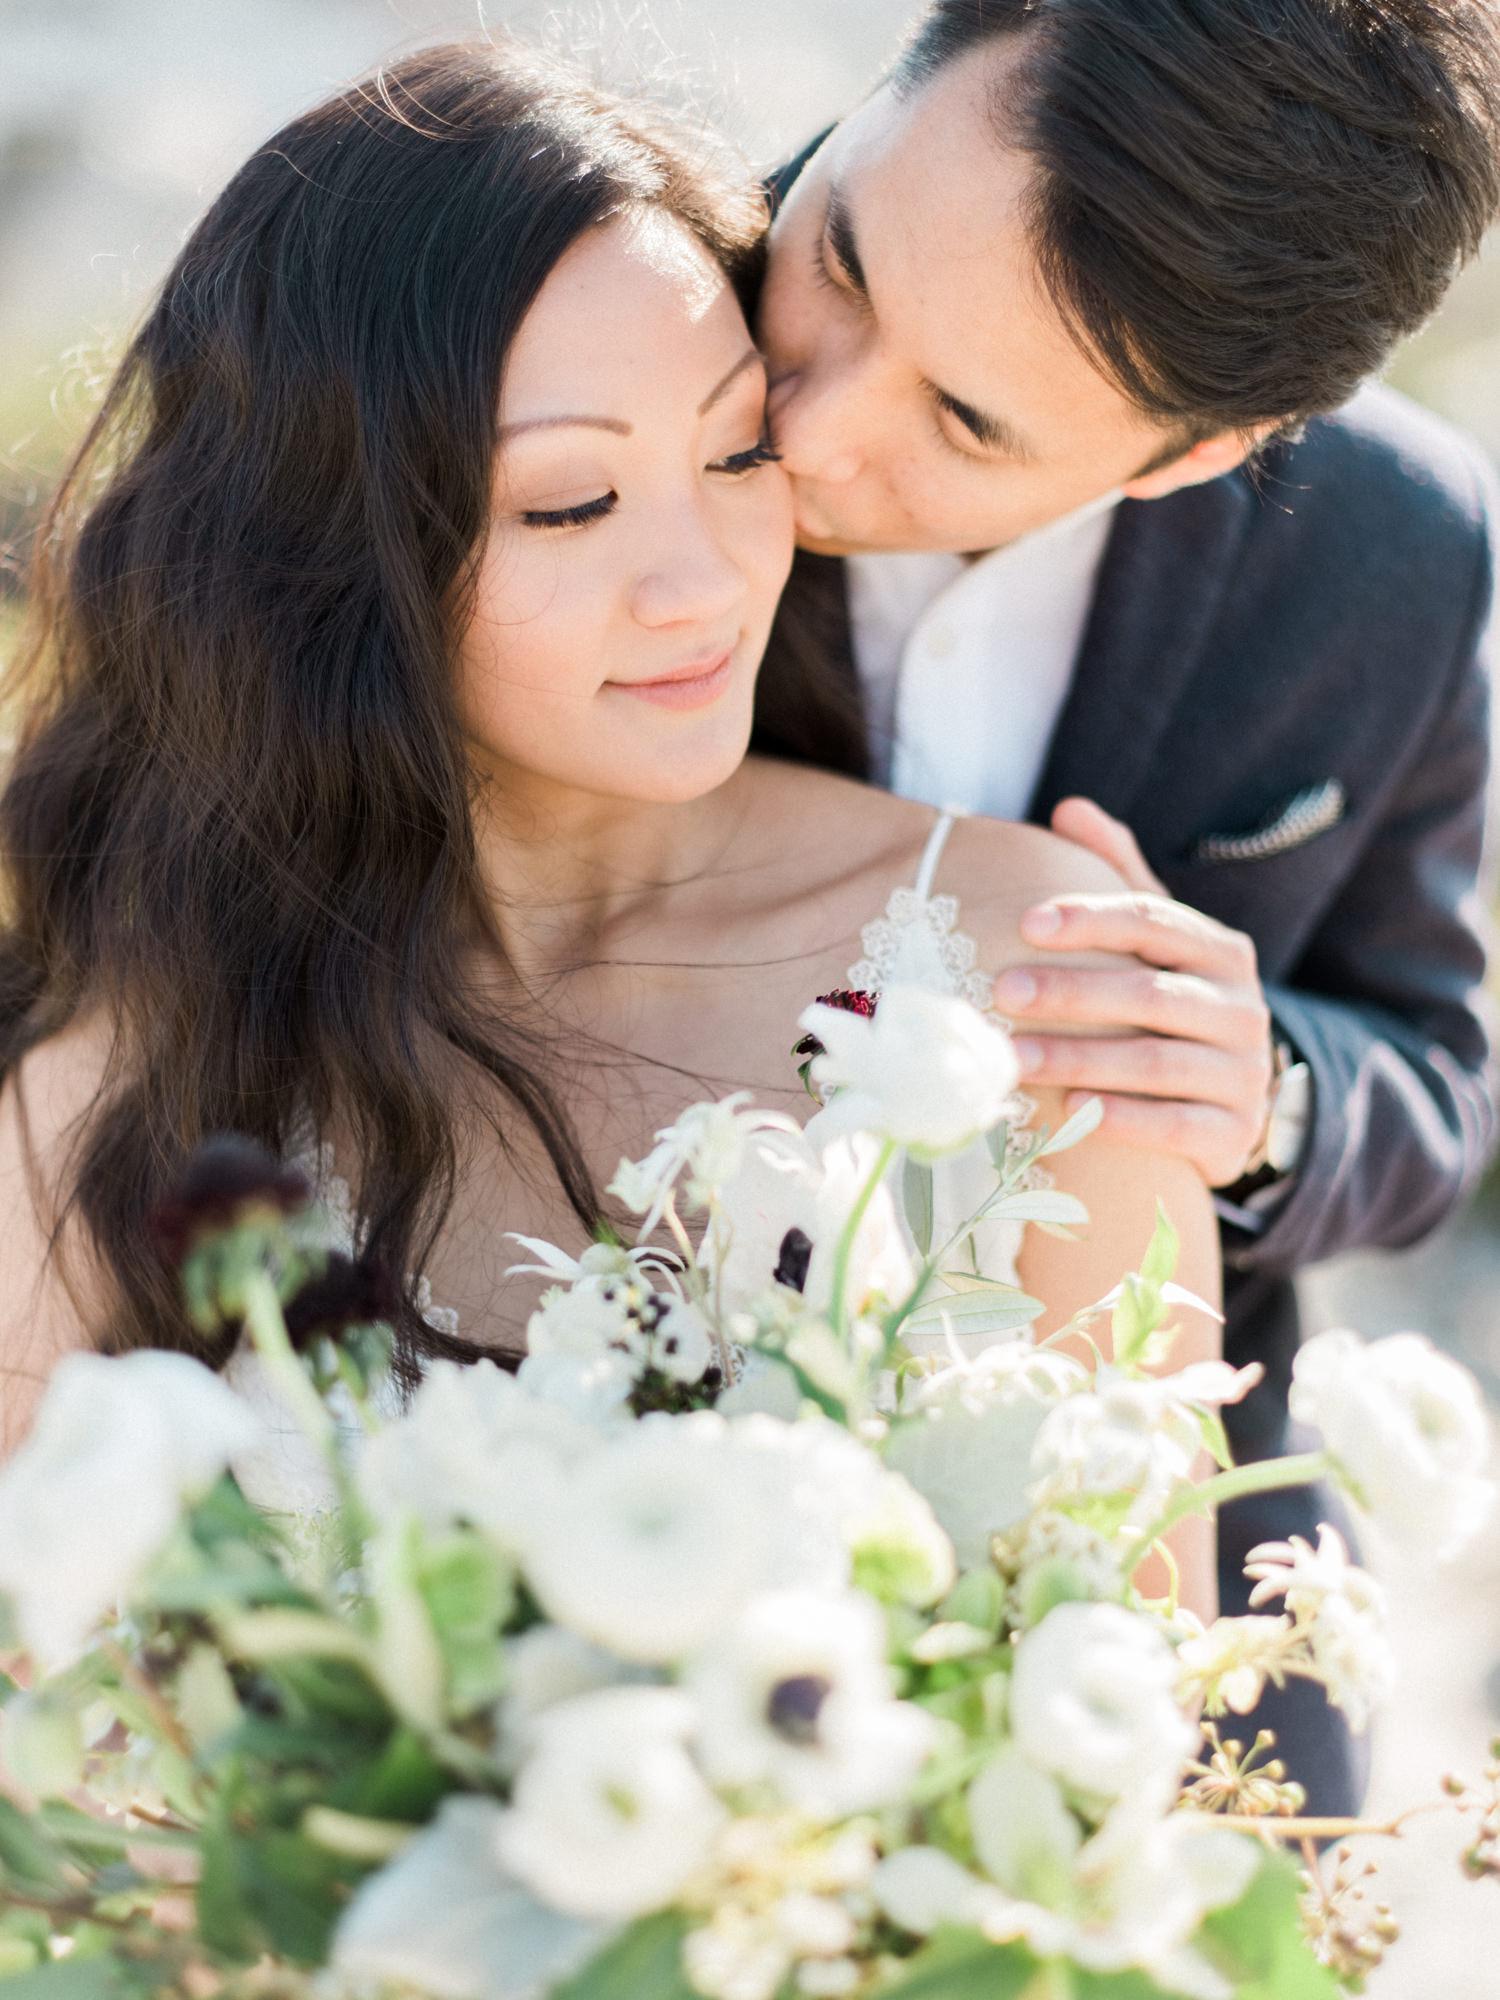 waop-marissa&sunny-engagement-0039.jpg